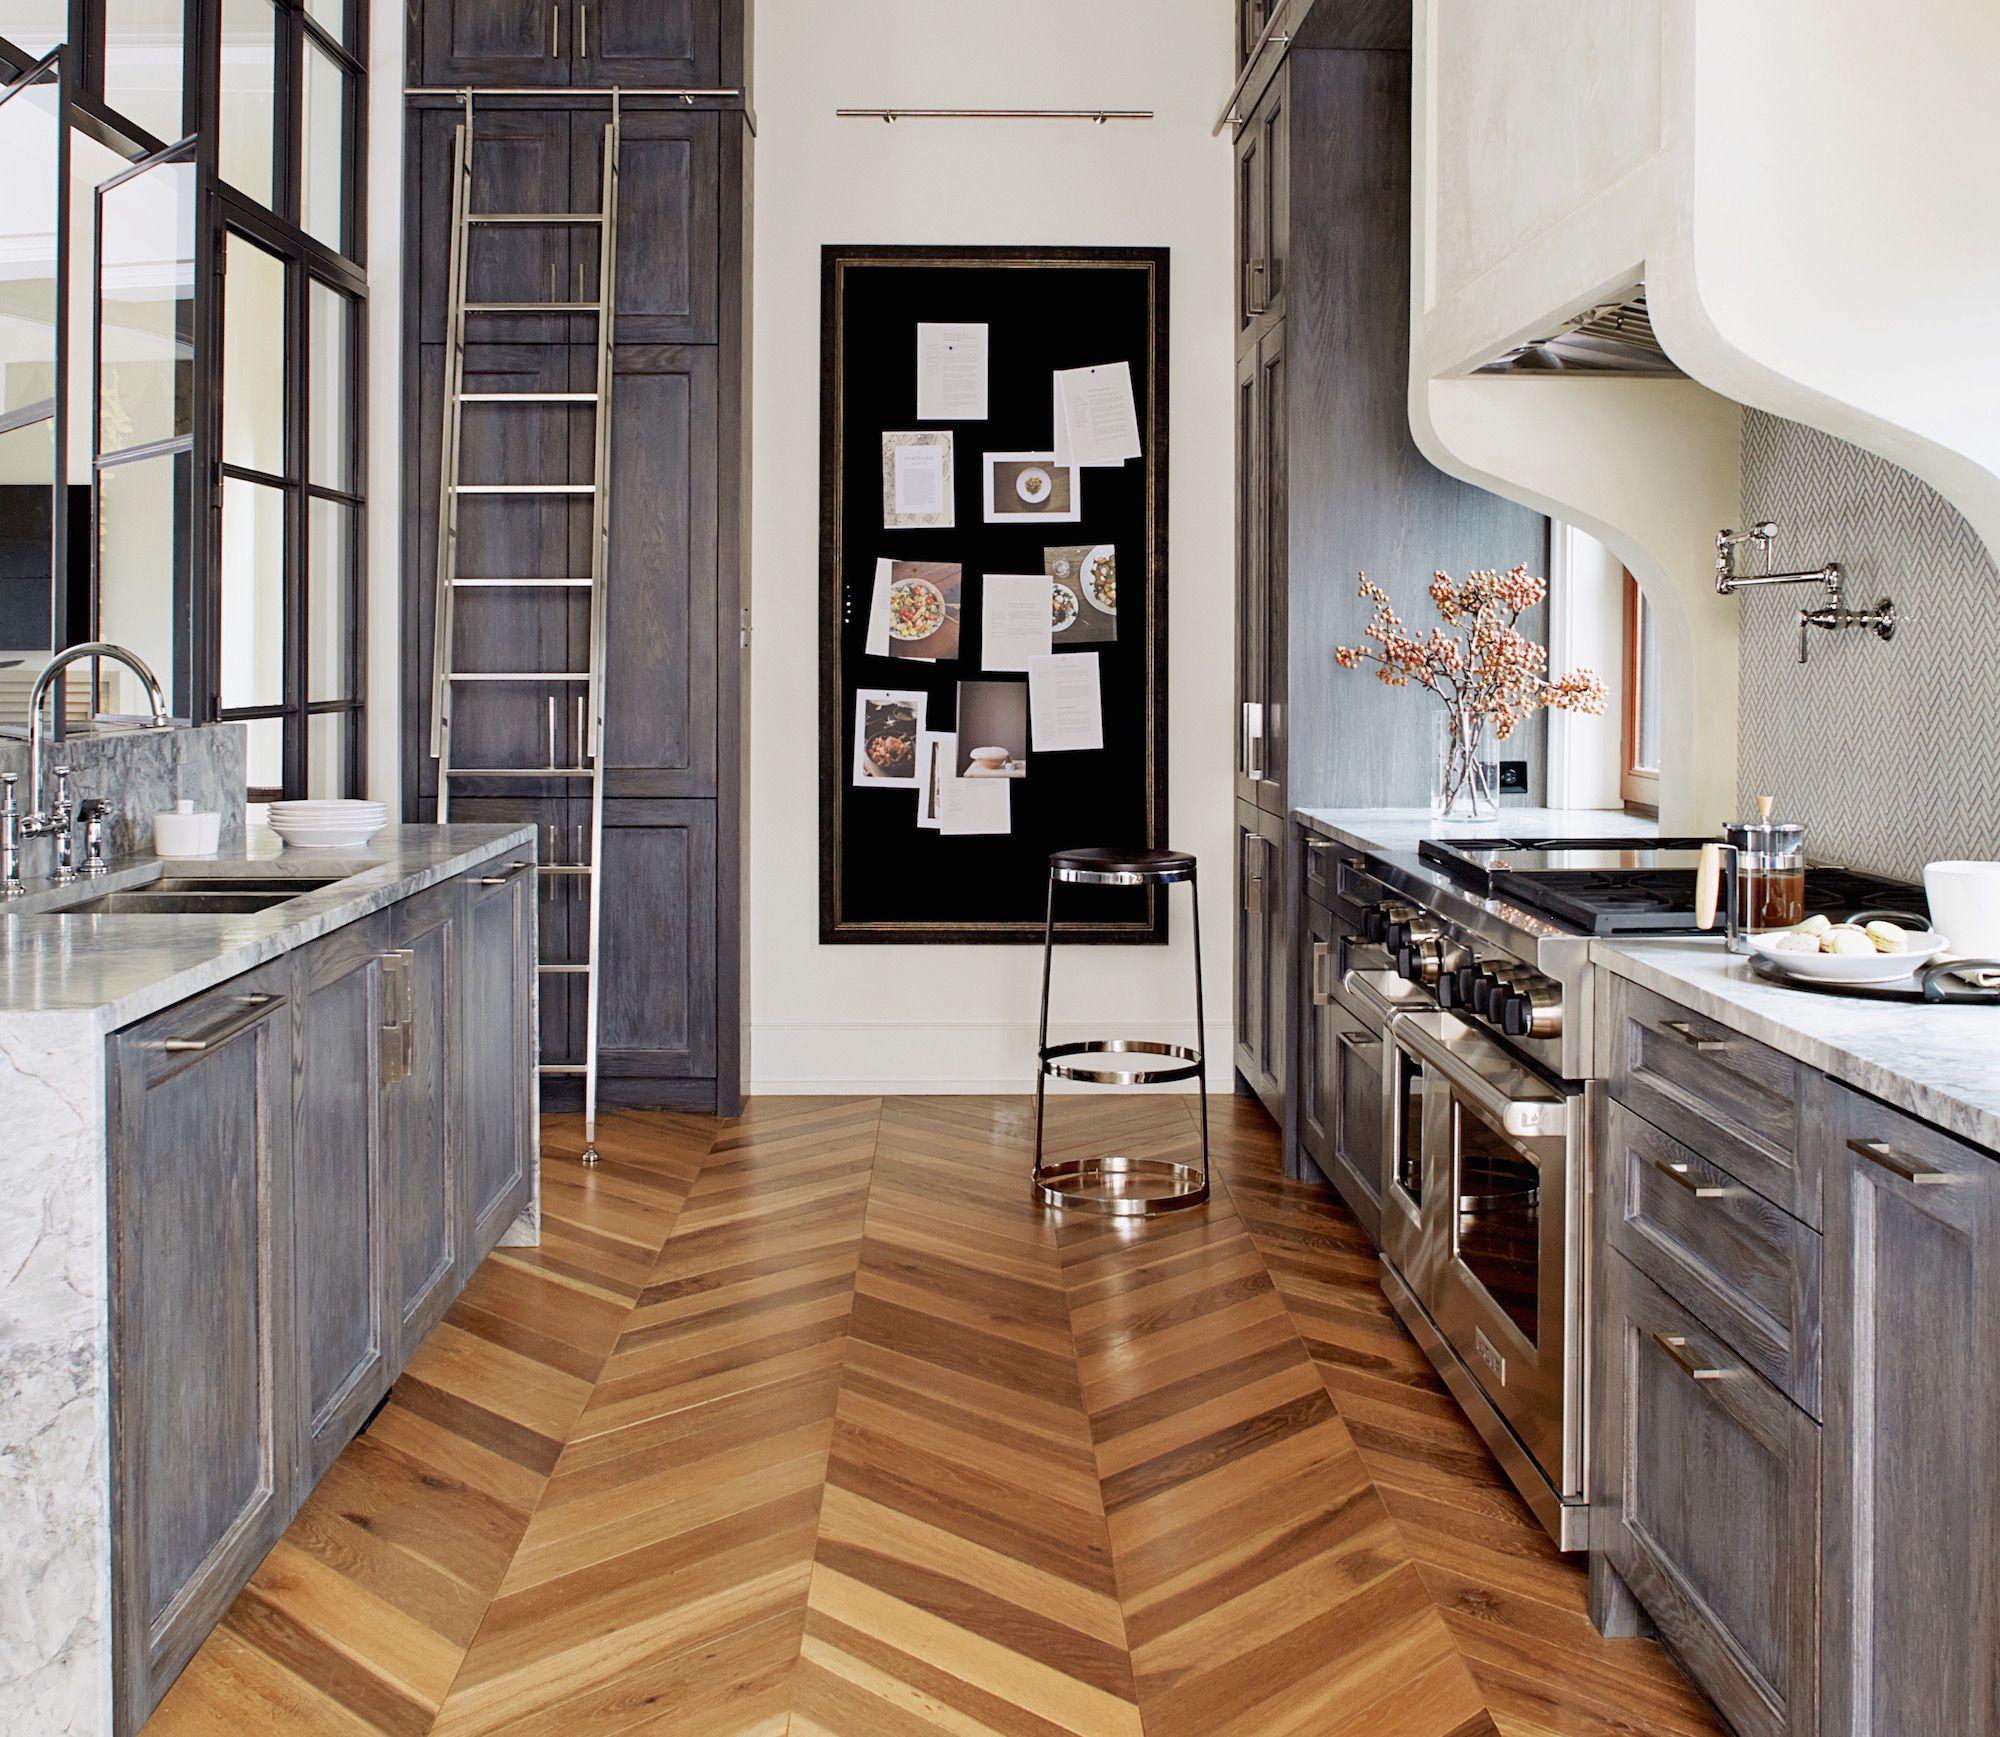 Beau 2015 Kitchen Of The Year, Atlanta Homes U0026 Lifestyles Magazine 2015 Sub Zero  KDC Global Winner, Transitional Kitchens